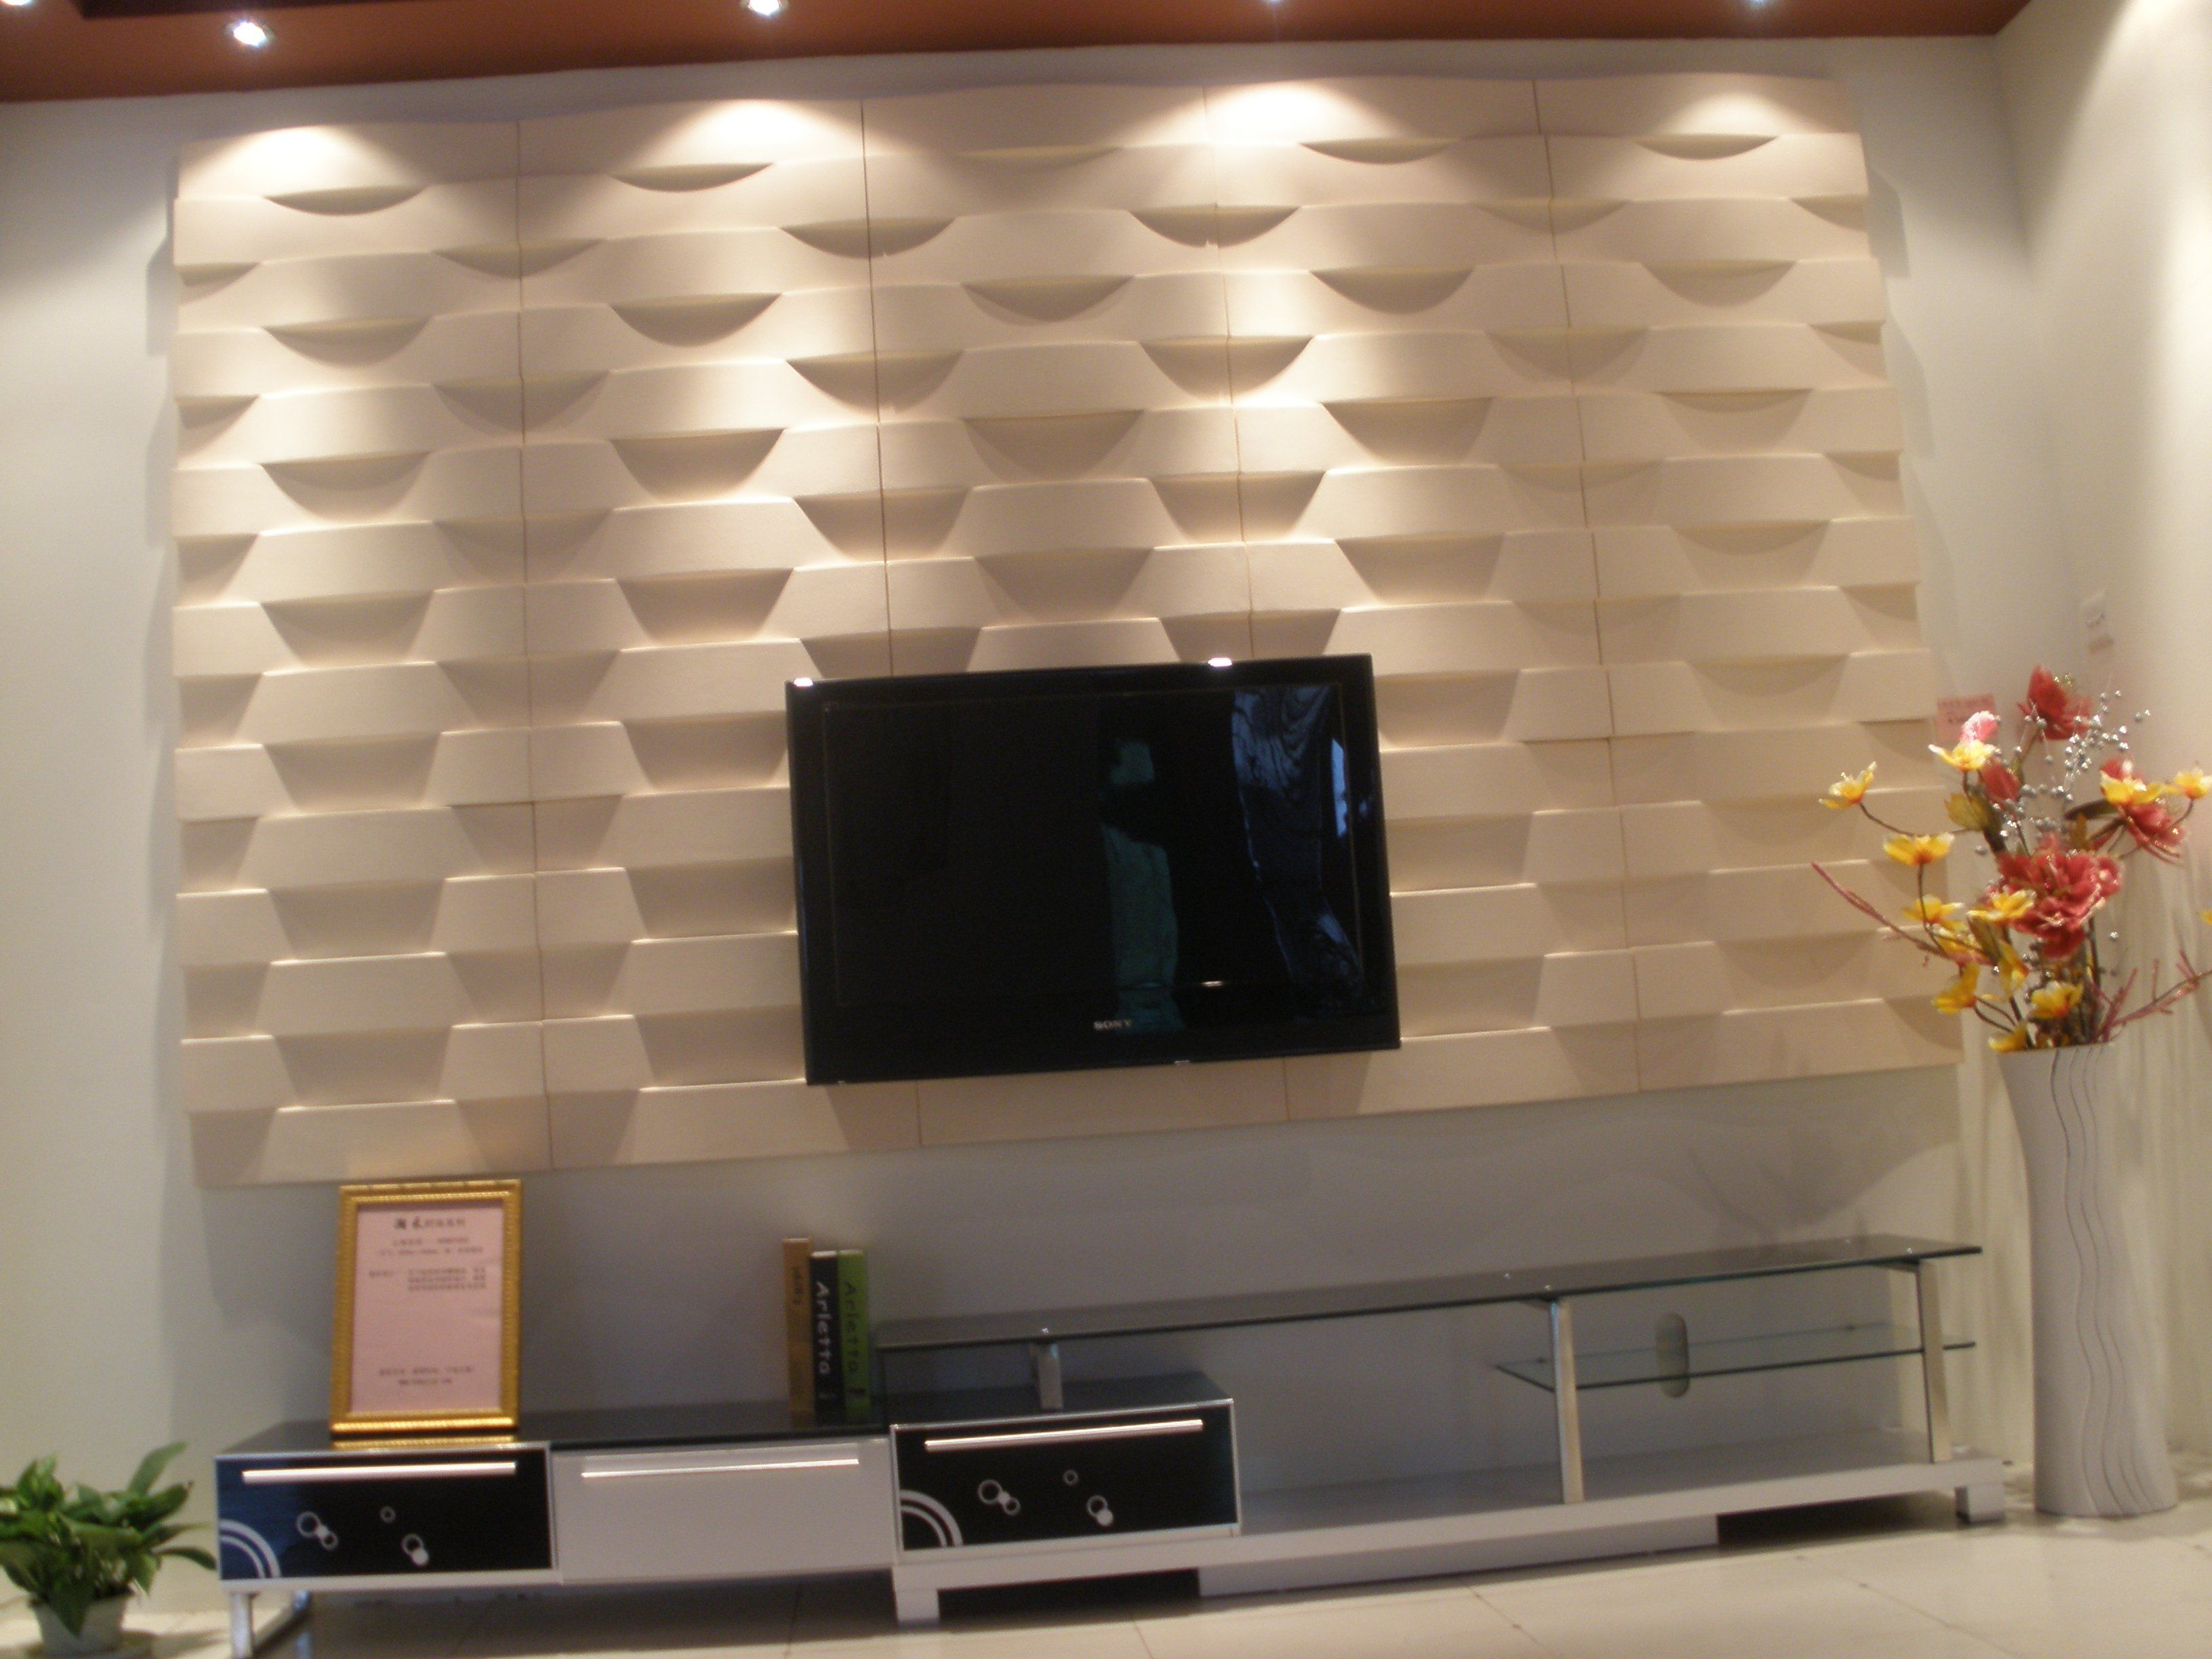 wood wall panel board cool wood wall. Decorating Panels Material Foam Featured Original Pu 3d Decorative Wall Wooden Decor Granite Walls Plaques Trim Ideas Plastic Covering Wood Panel Board Cool